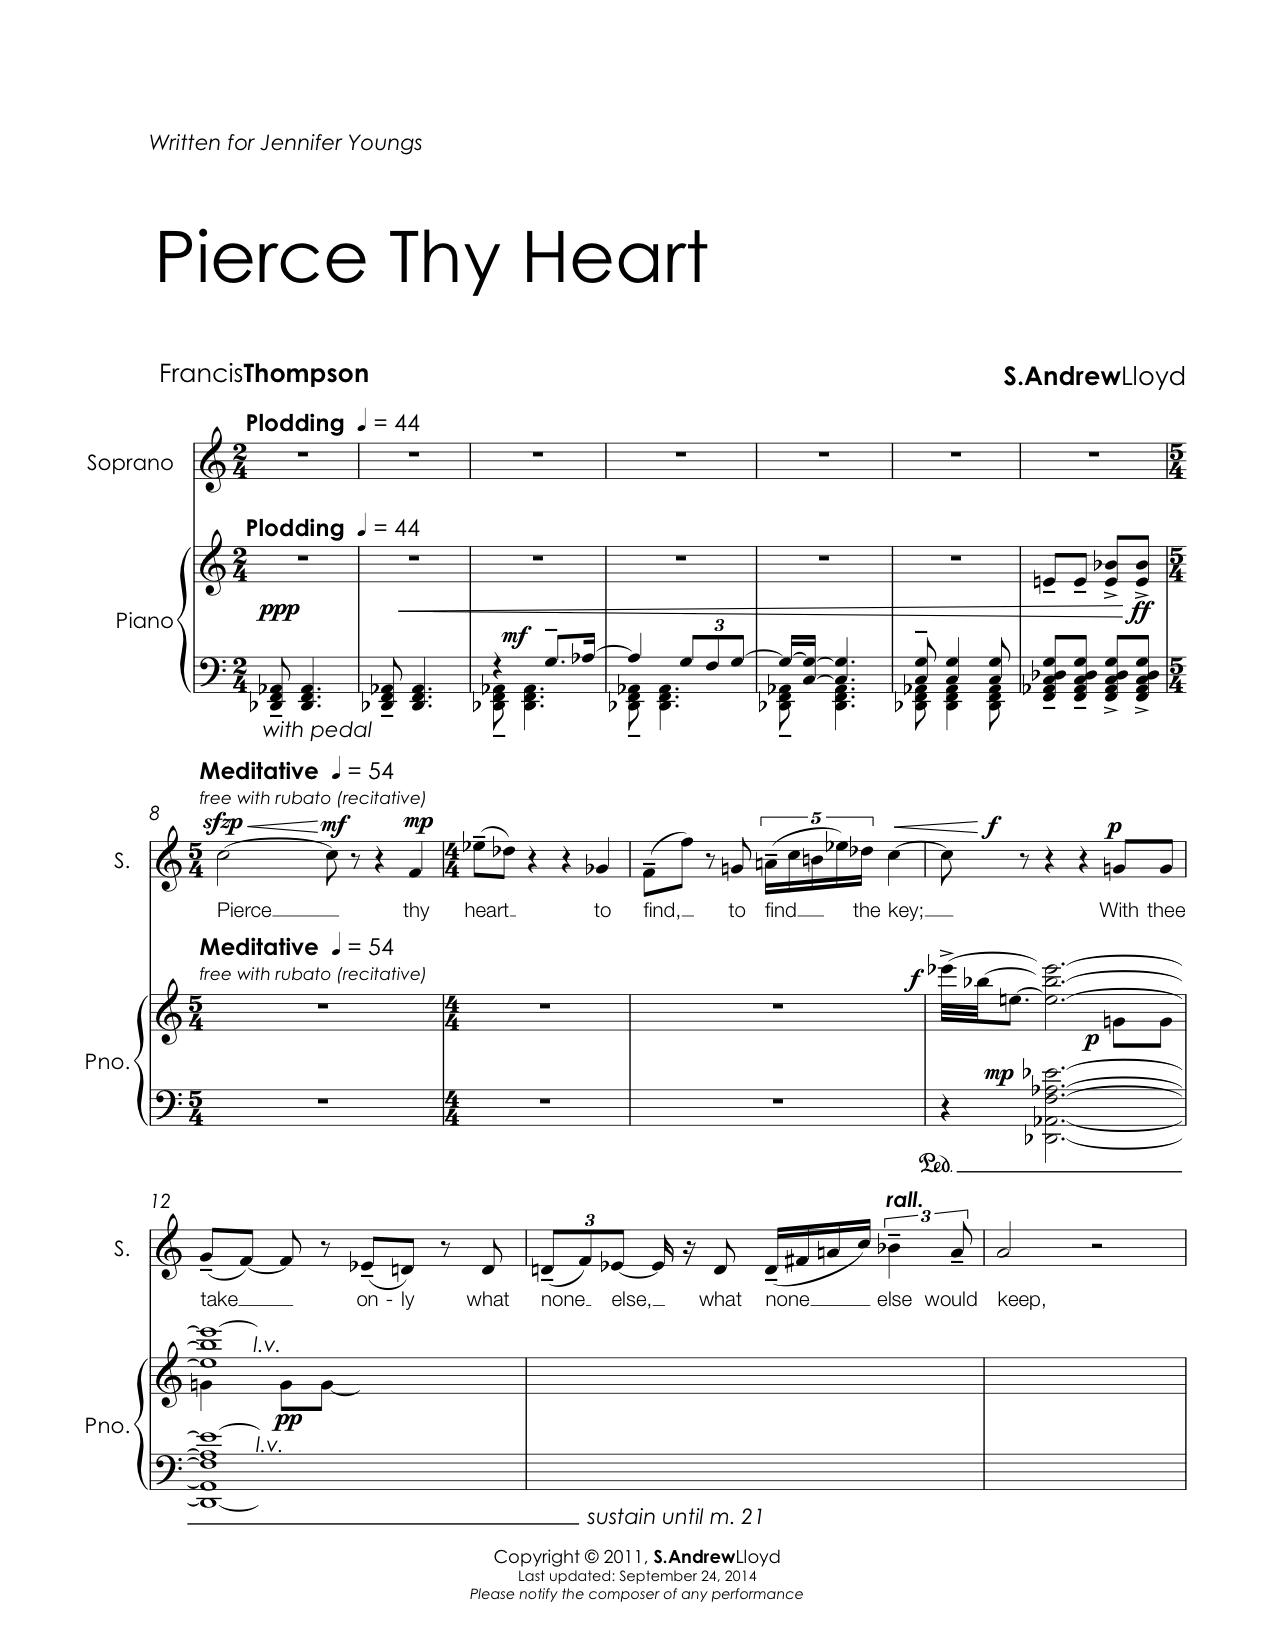 Pierce Thy Heart Sample 1.jpg